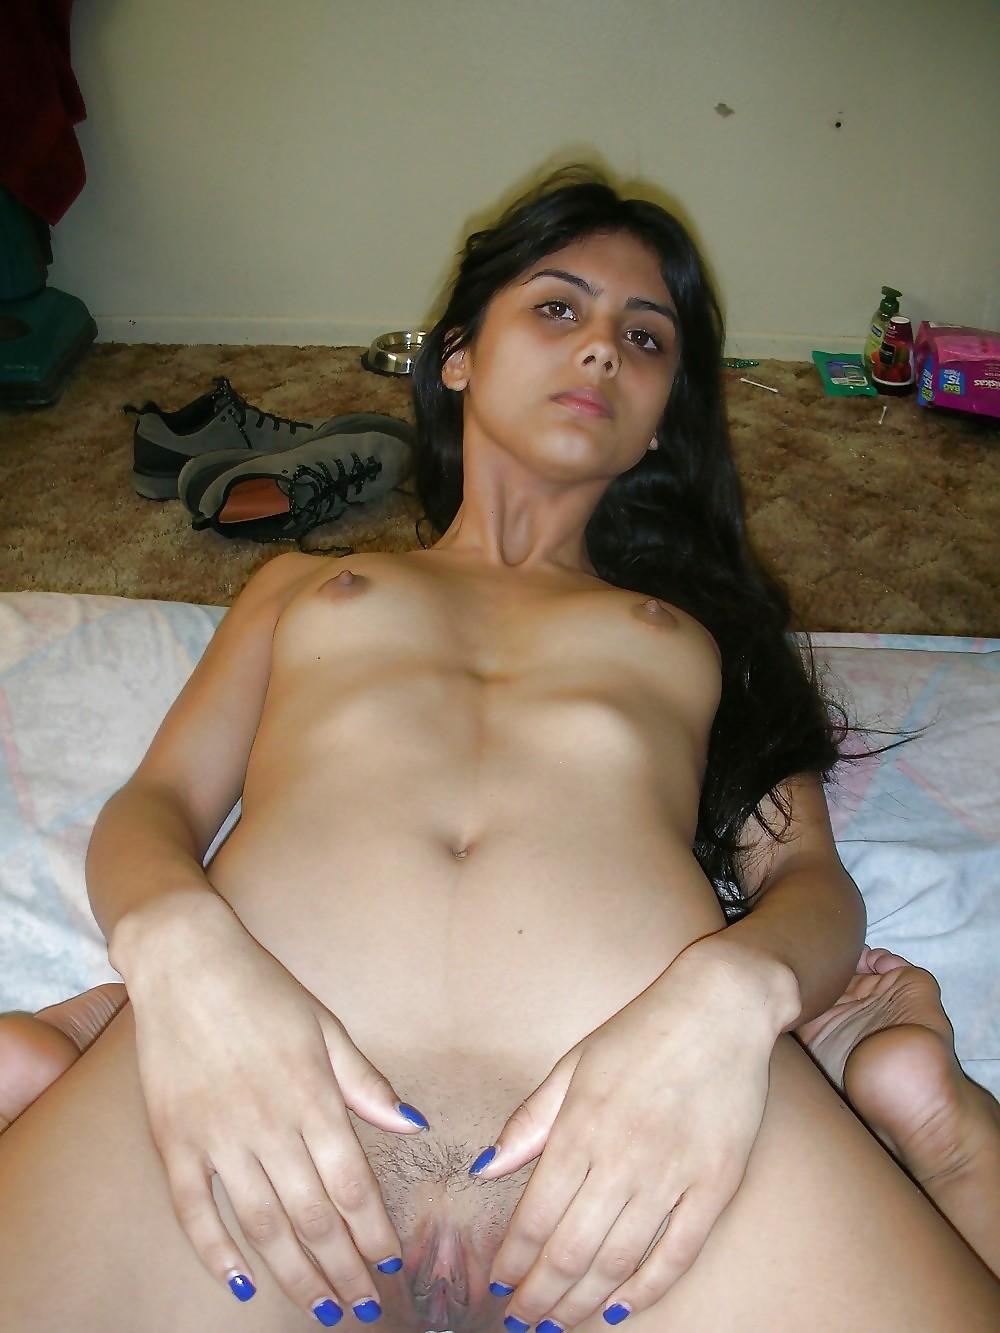 Pakistani Girls Showing Hairy Pussy